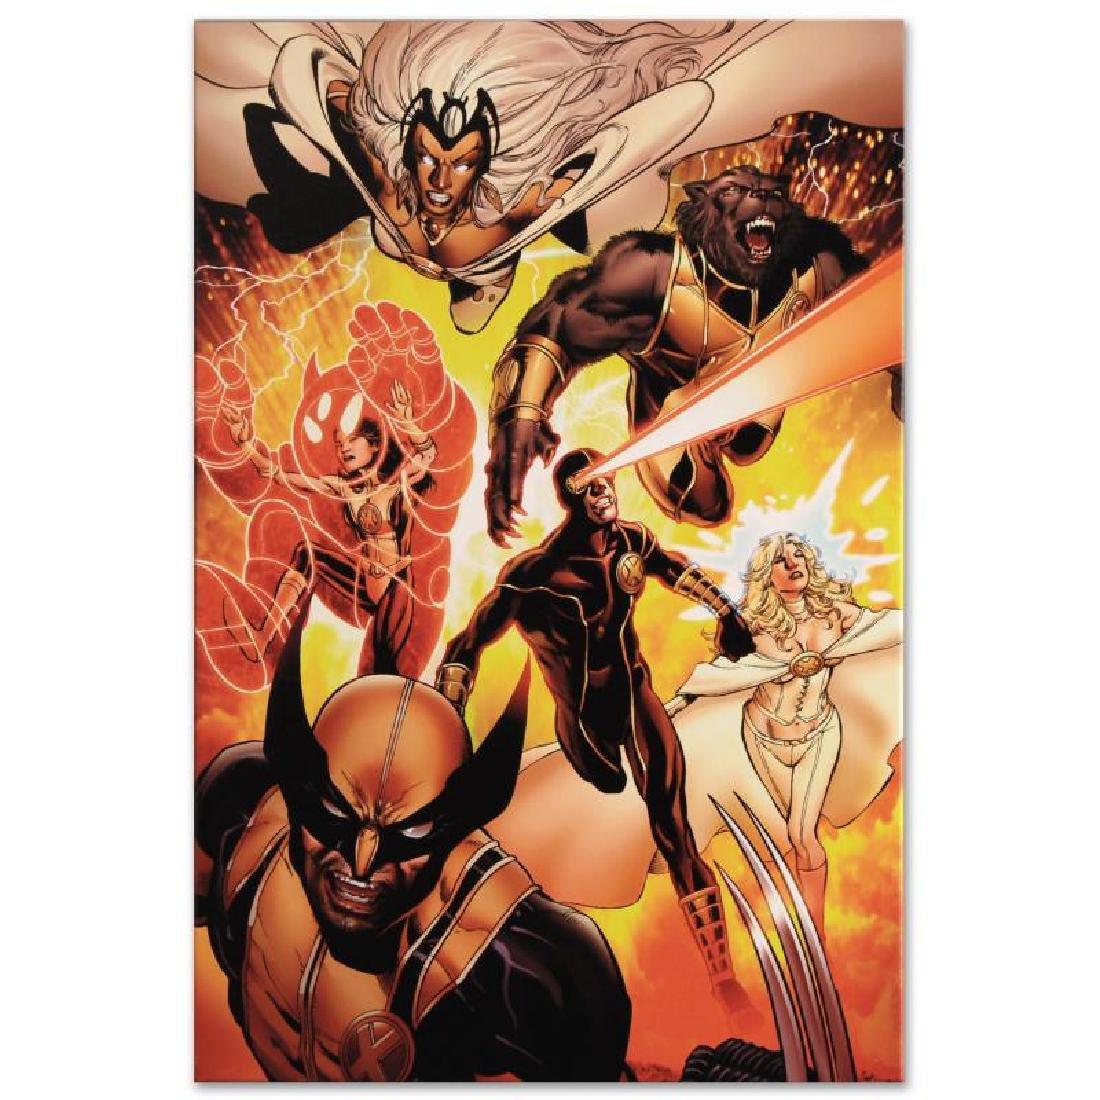 Astonishing X-Men #35 by Marvel Comics - 3